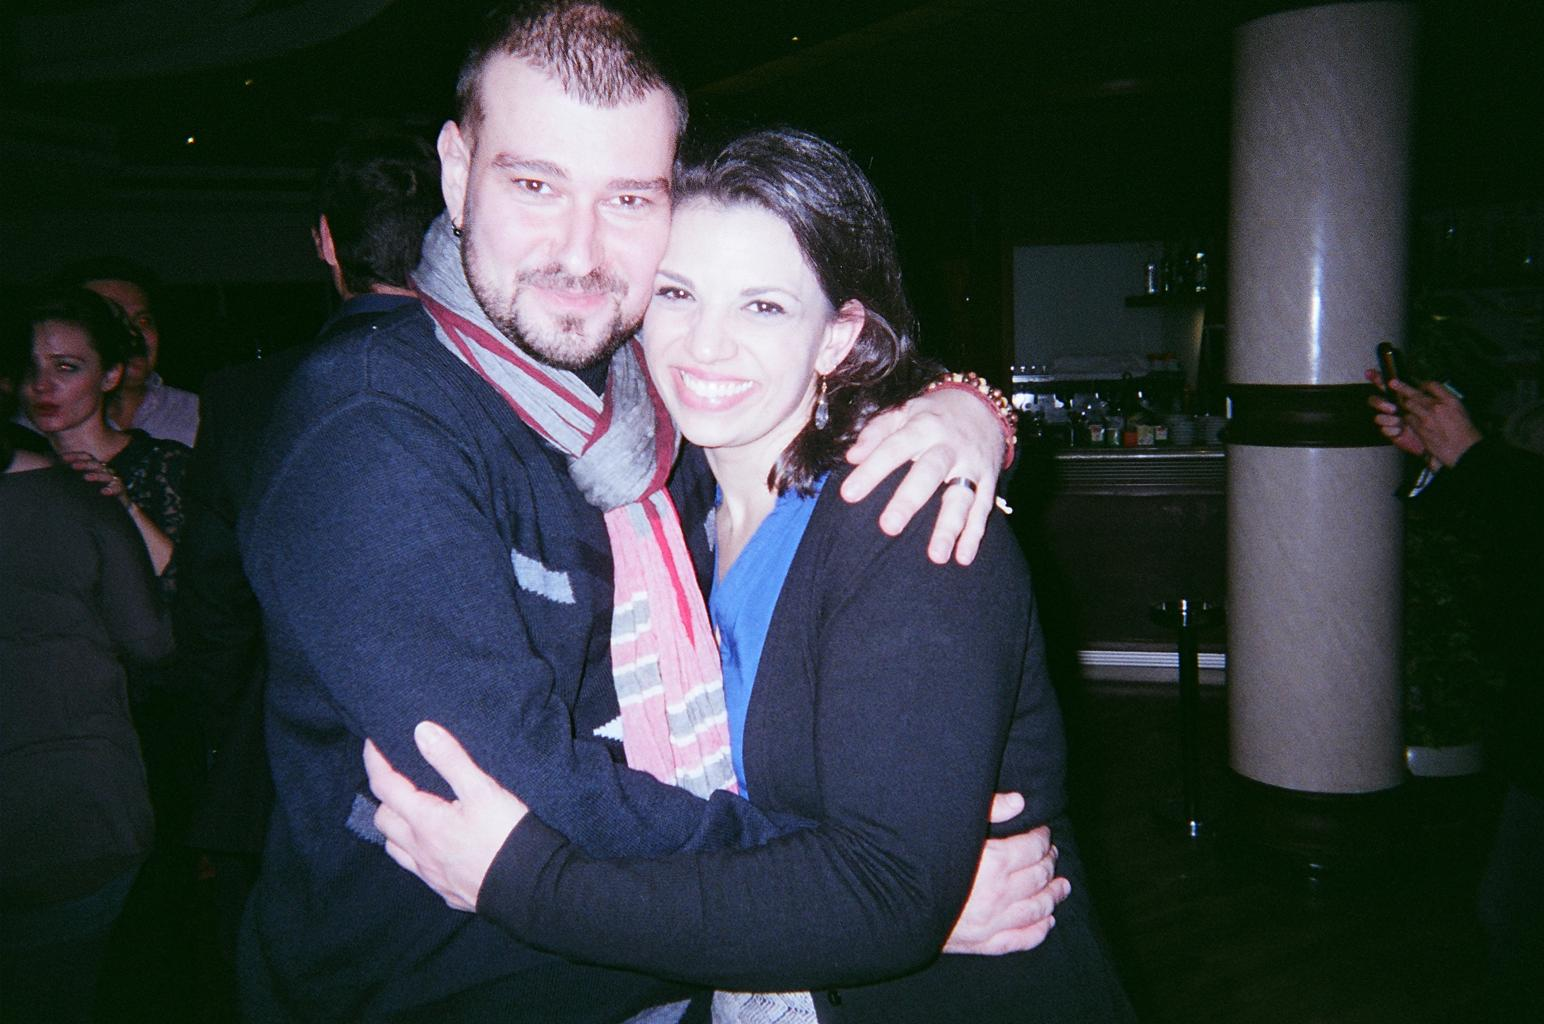 Ivo Yordanov and Jessica Rose Cambio